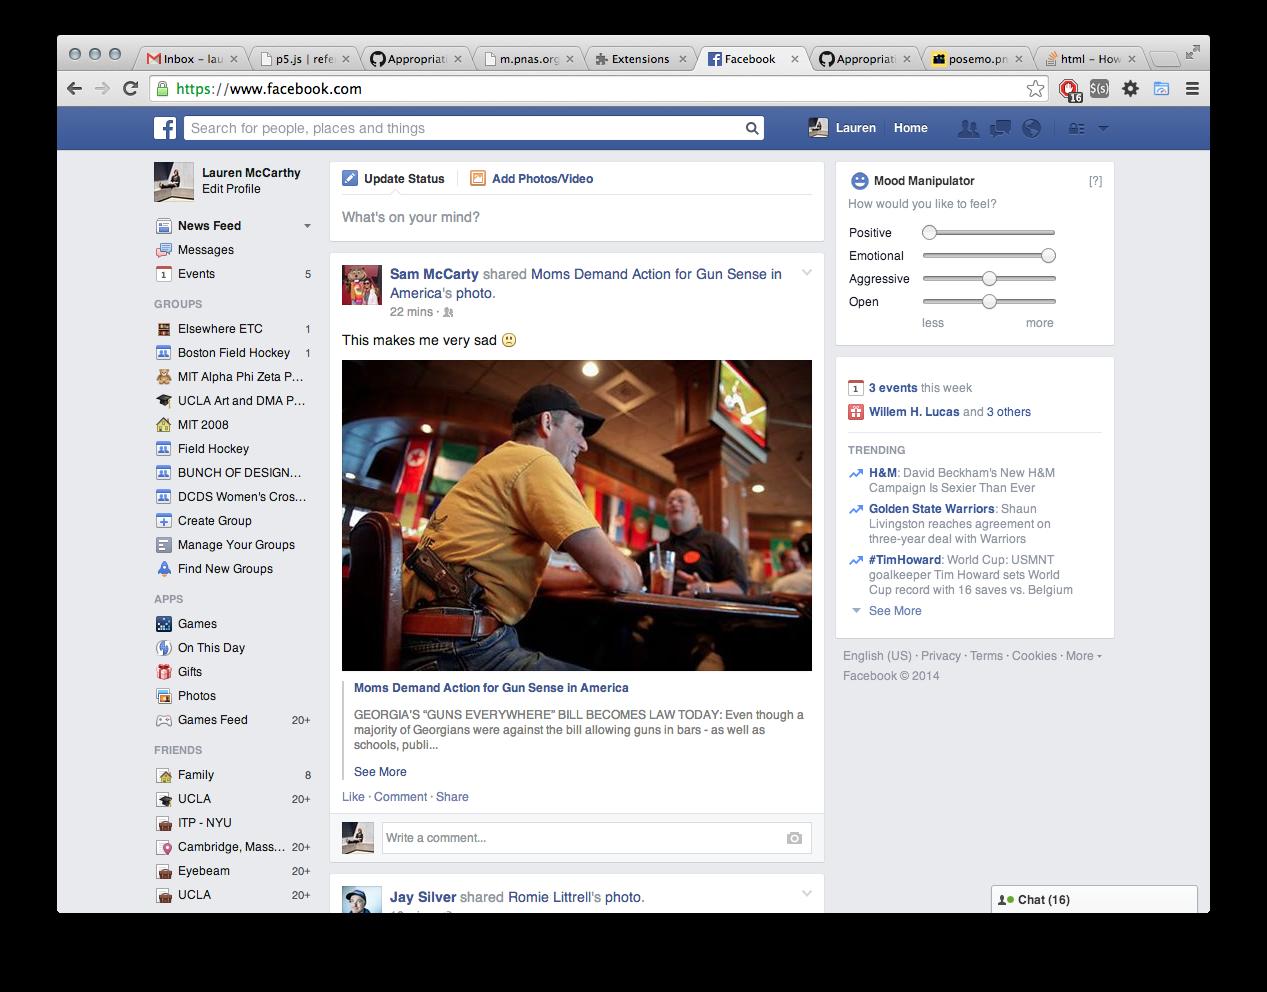 Facebook Mood Manipulator - lauren mccarthy